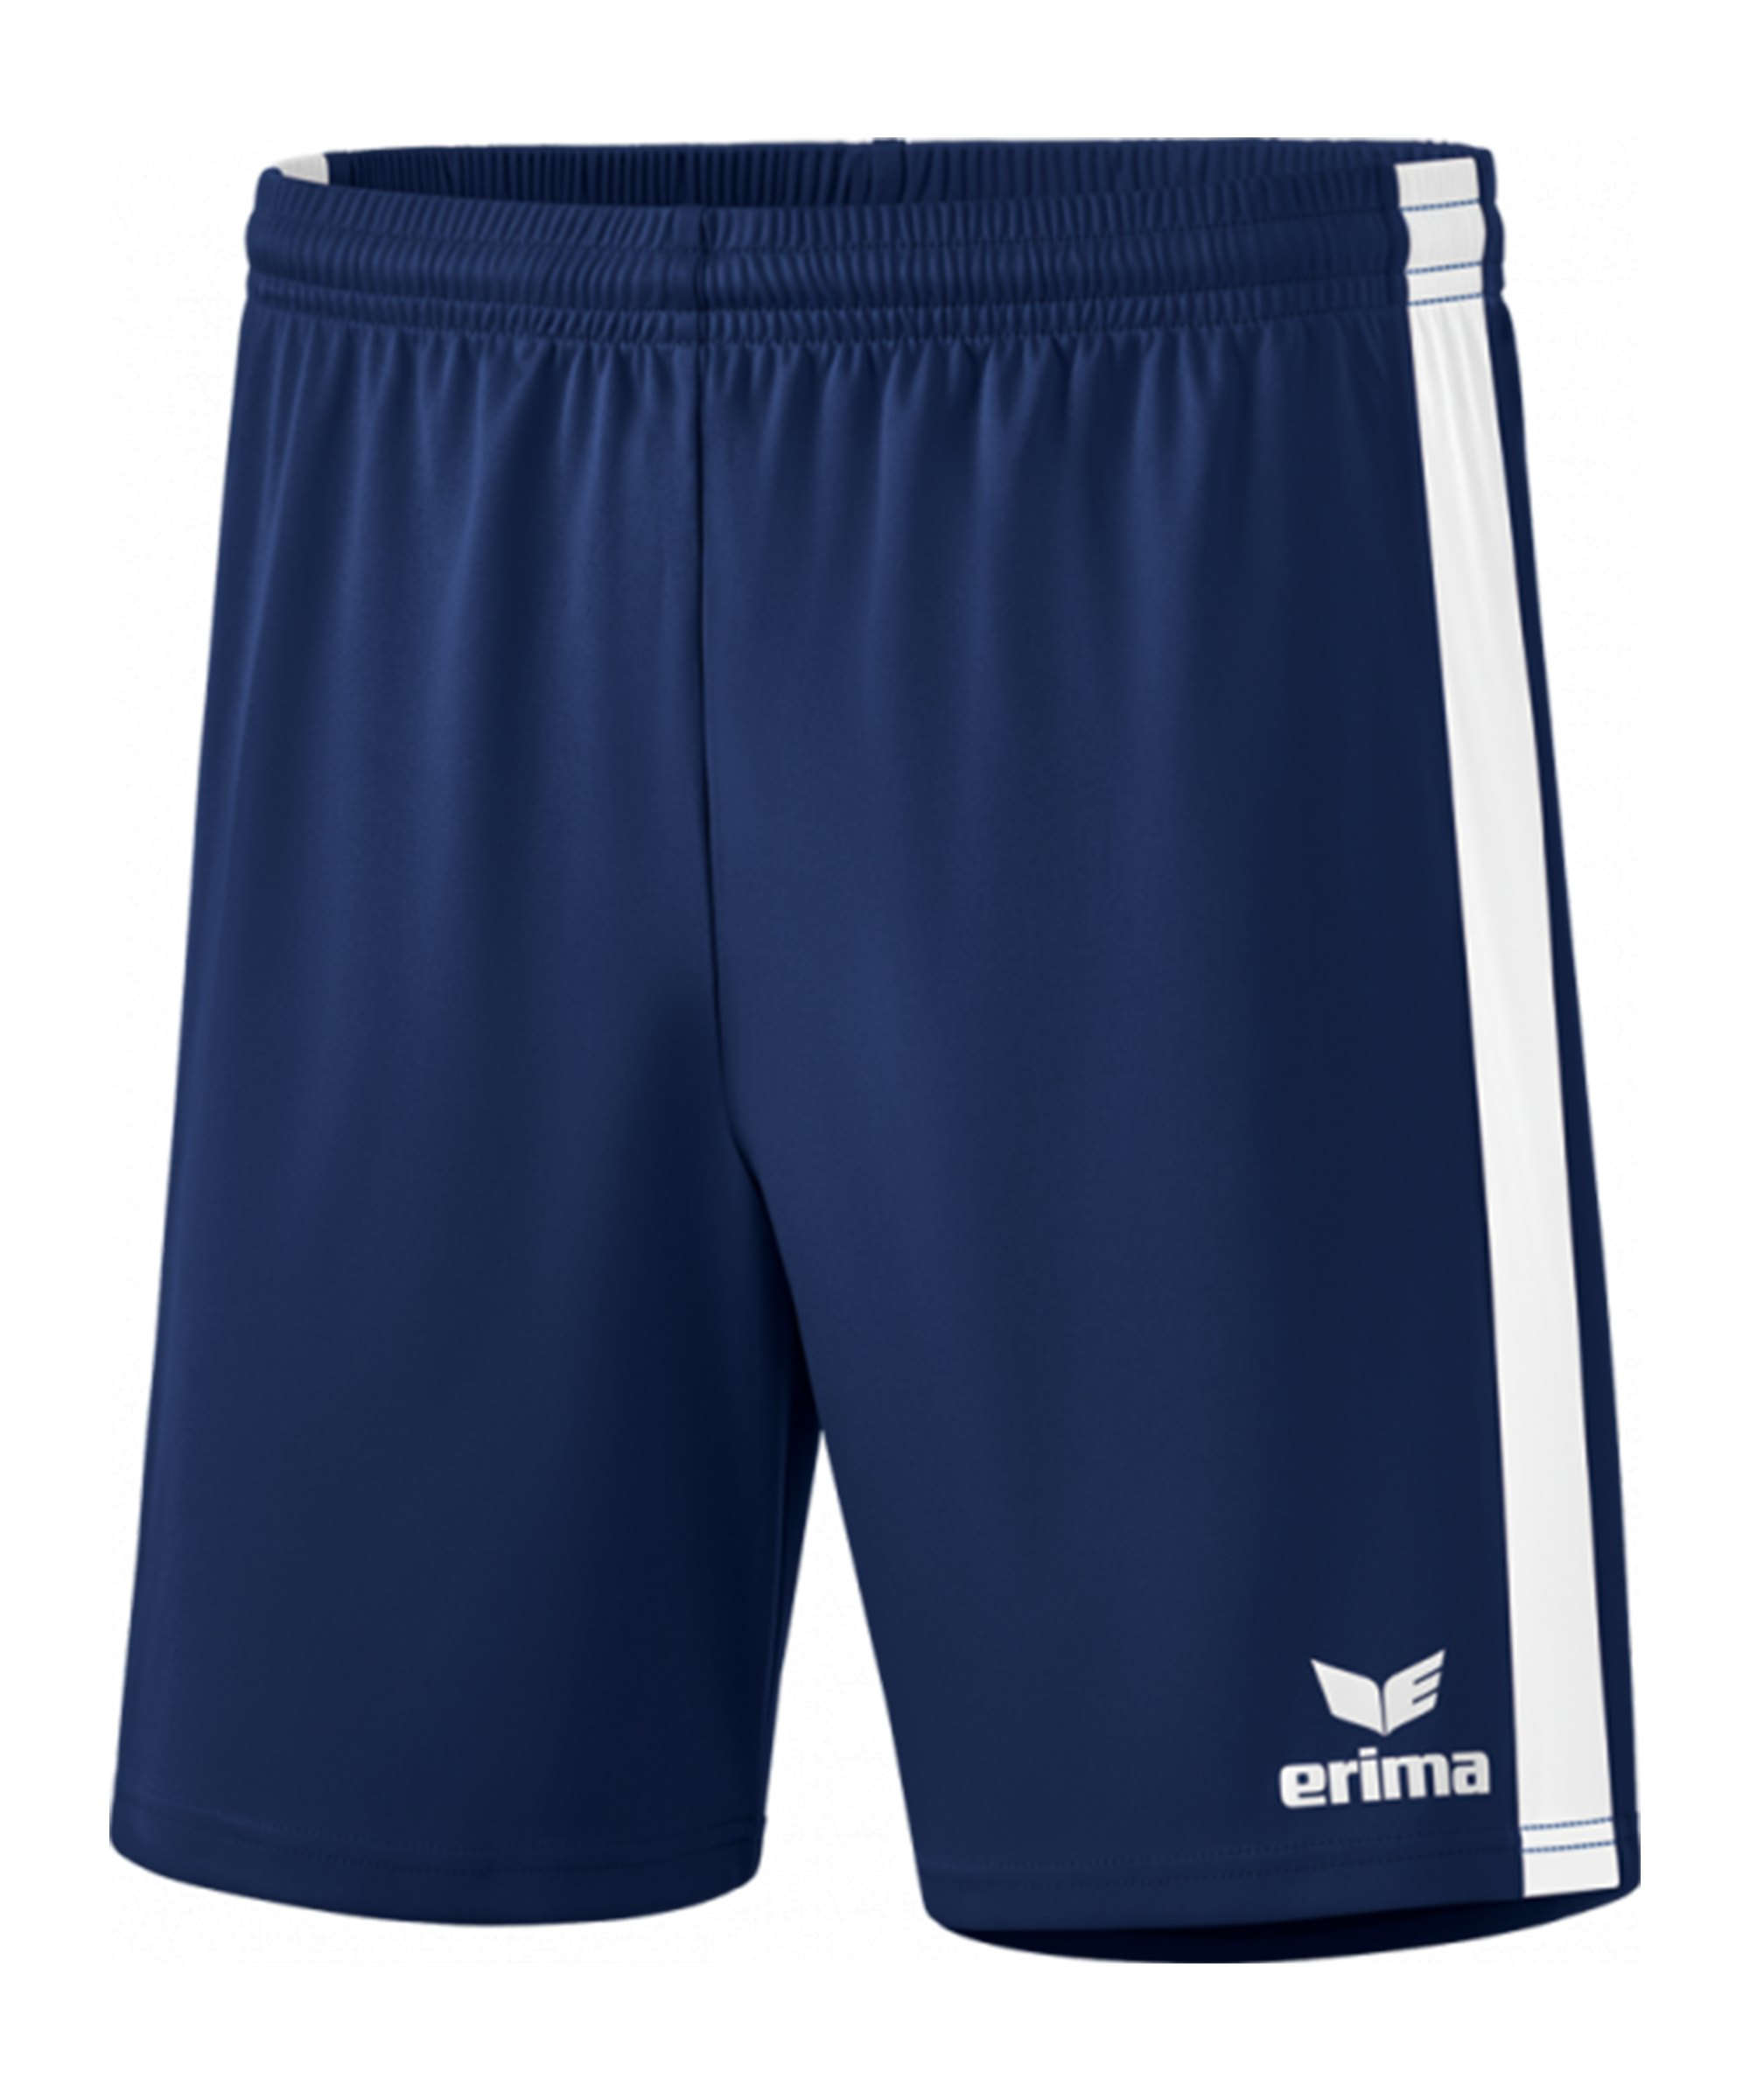 Erima Retro Star Shorts Blau Weiss - blau